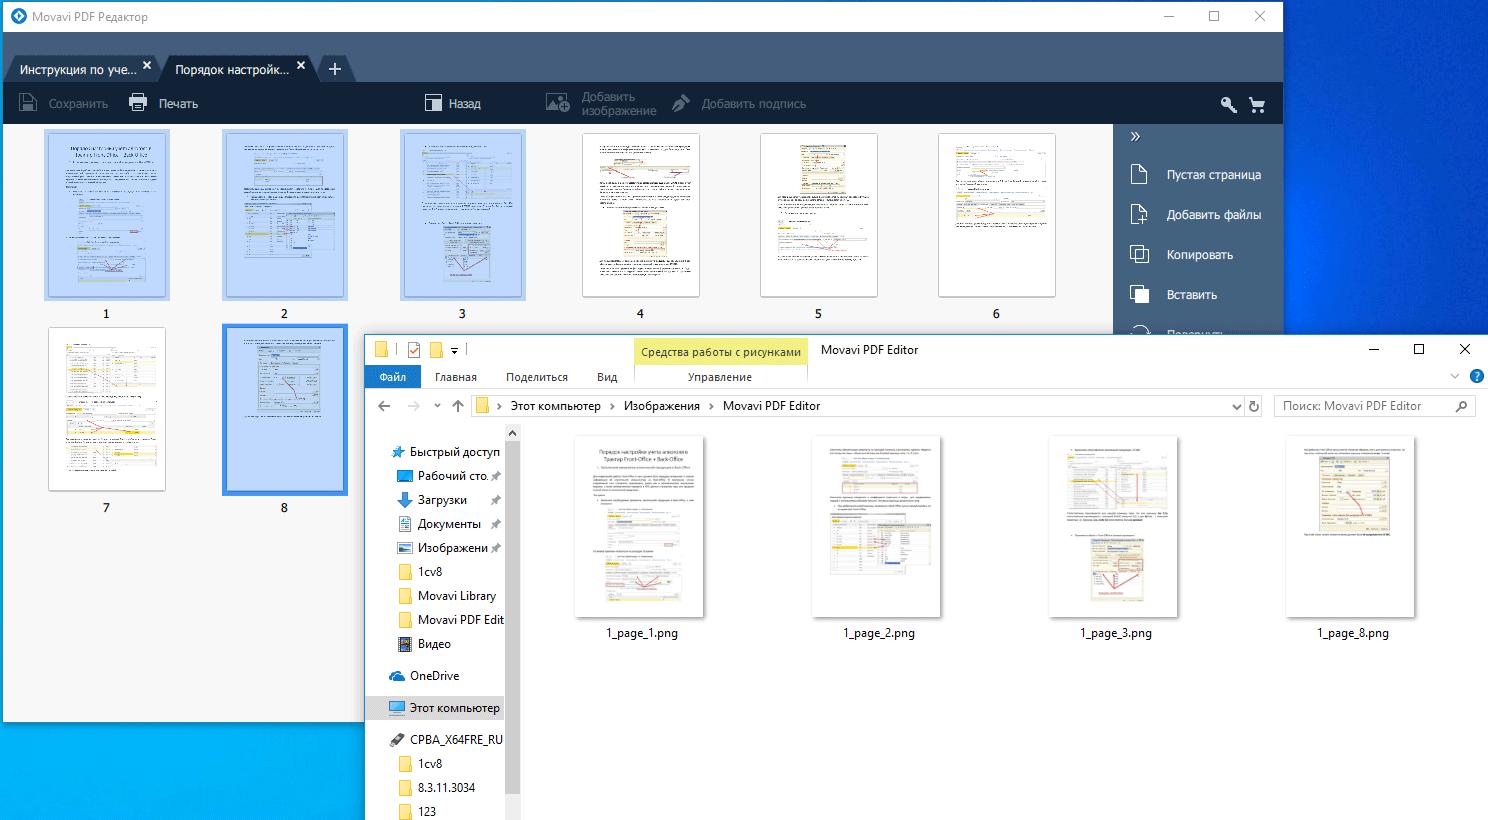 https://interface31.ru/tech_it/images/Movavi-PDF-editor-006.png